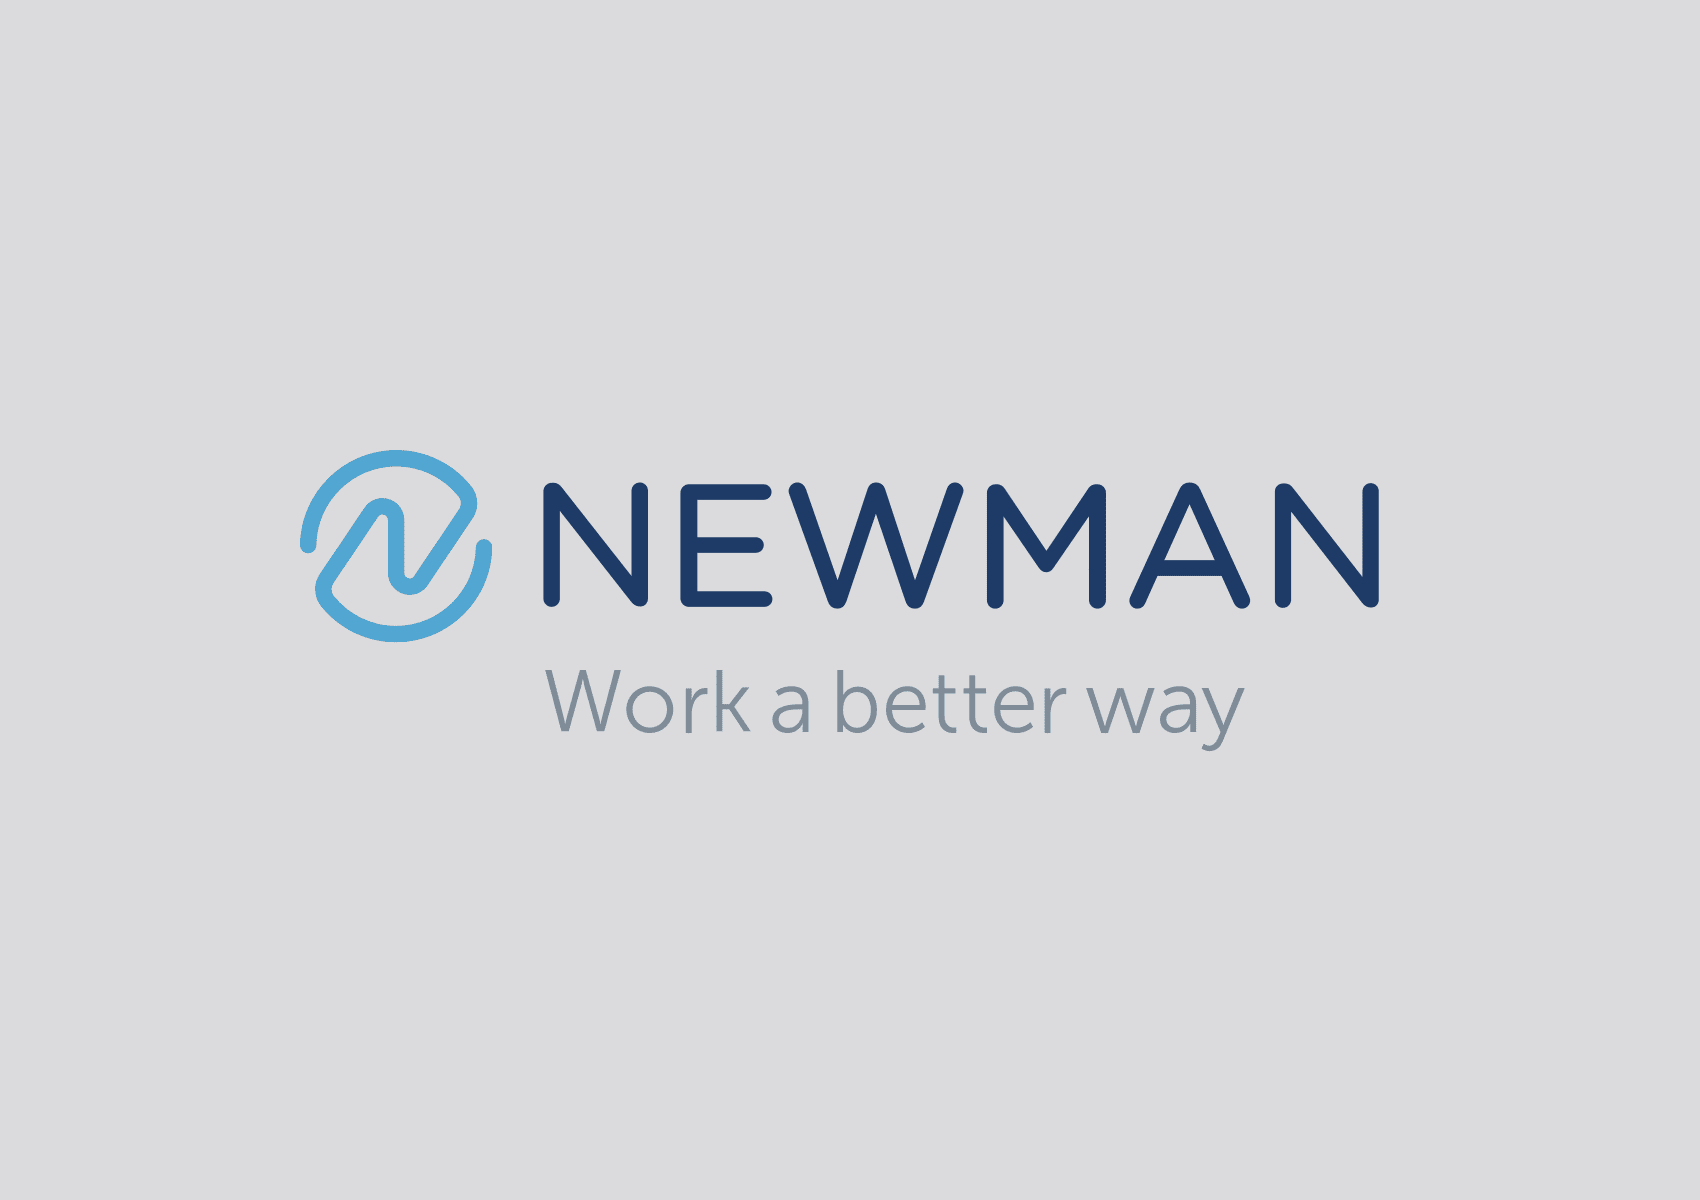 Newman brand identity